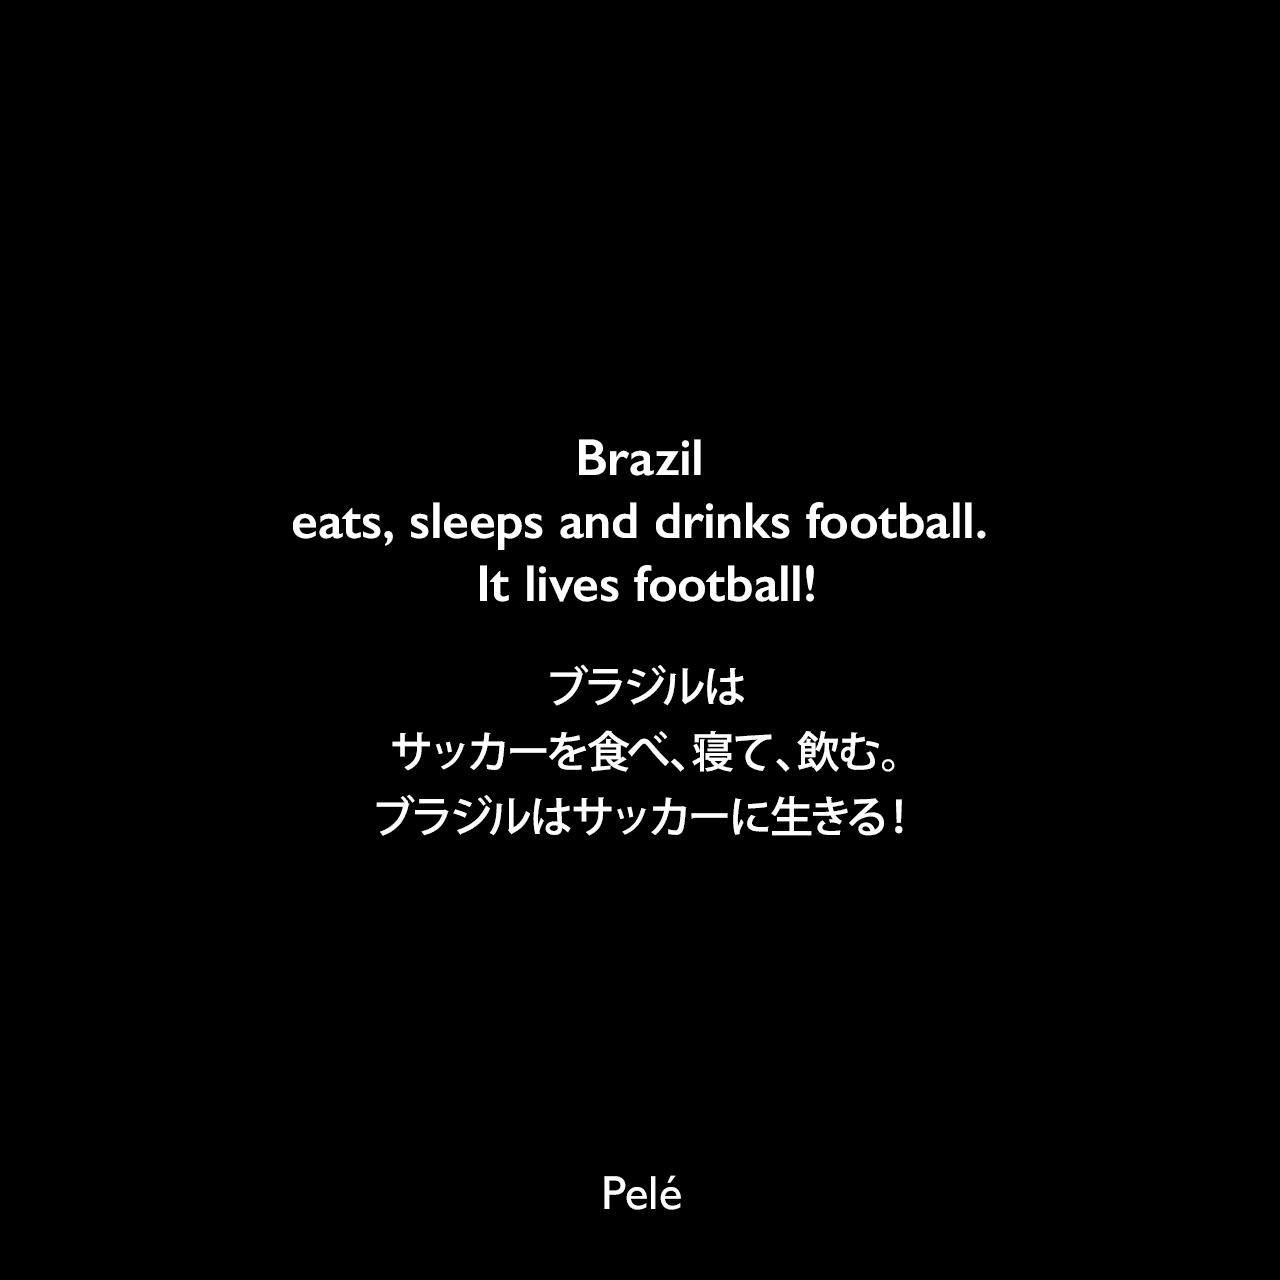 Brazil eats, sleeps and drinks football. It lives football!ブラジルはサッカーを食べ、寝て、飲む。ブラジルはサッカーに生きる!Pelé